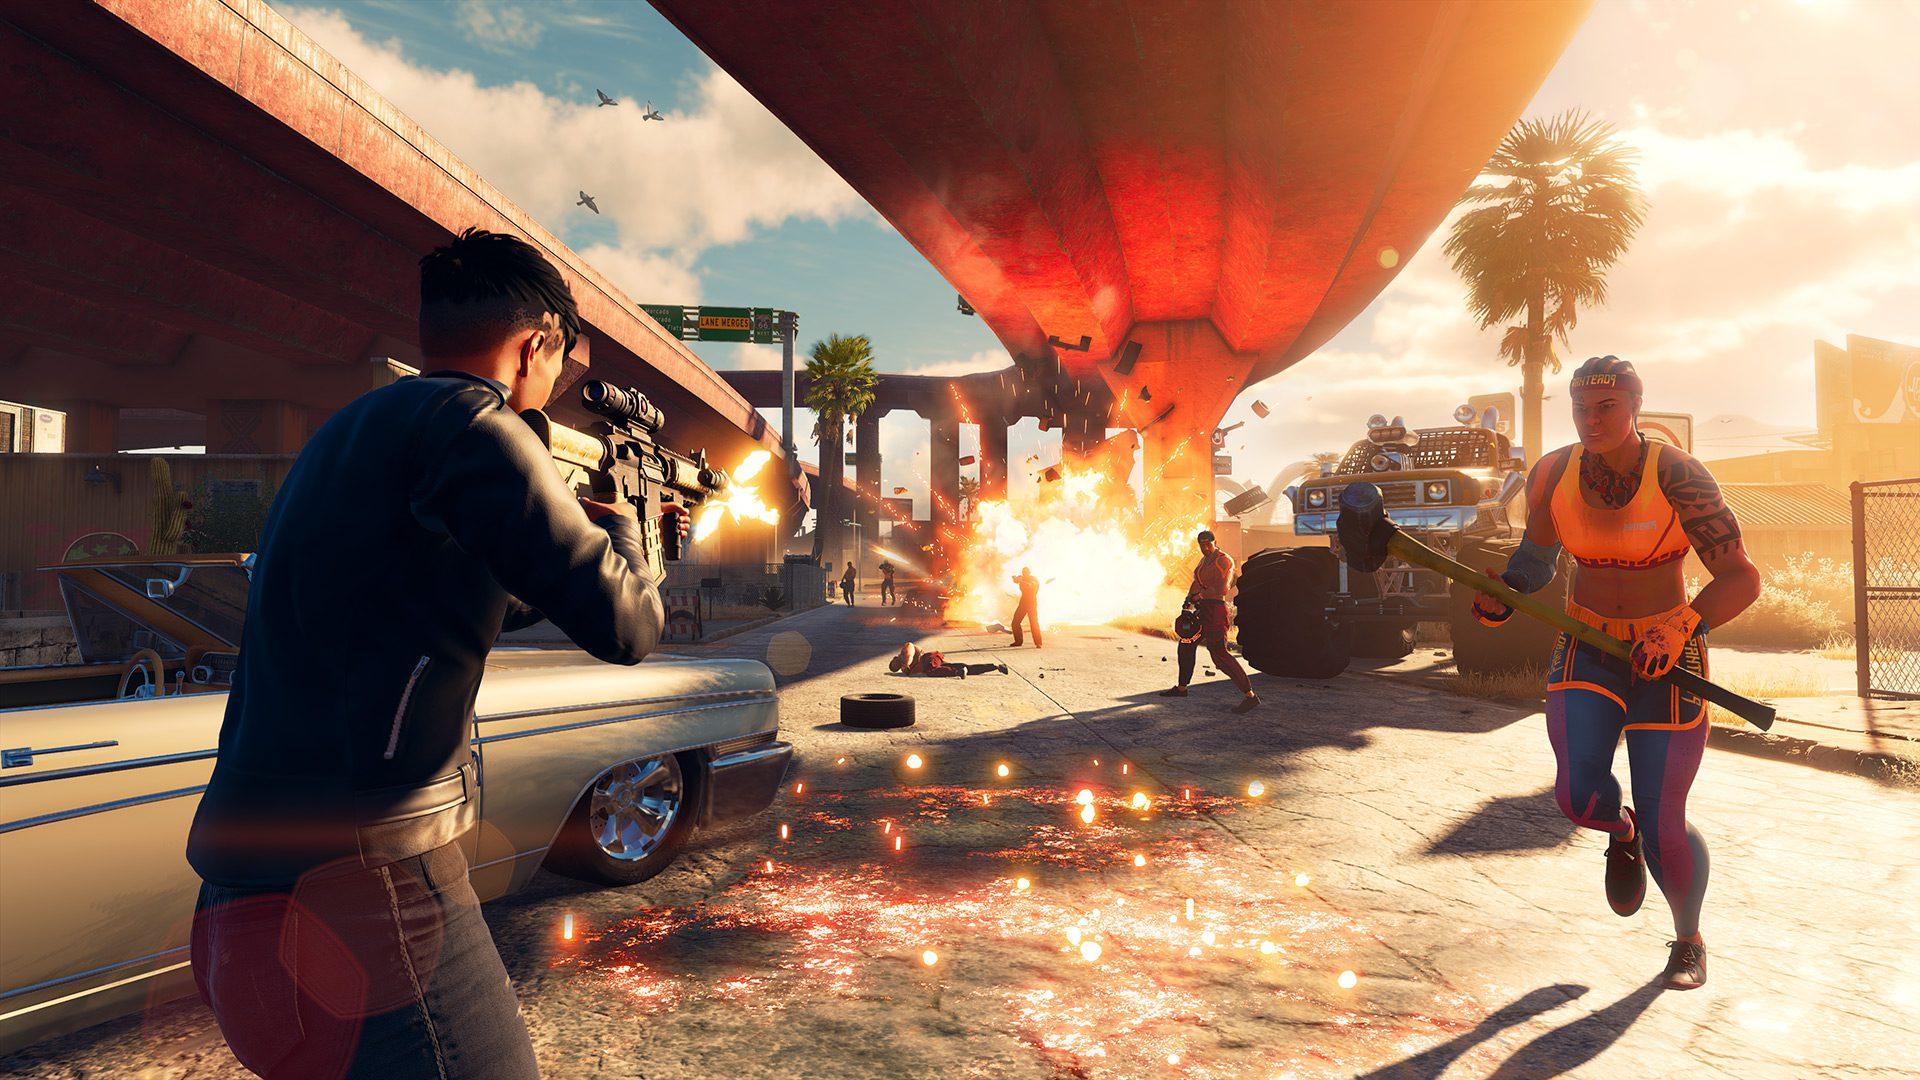 A shootout with the Los Panteros gang